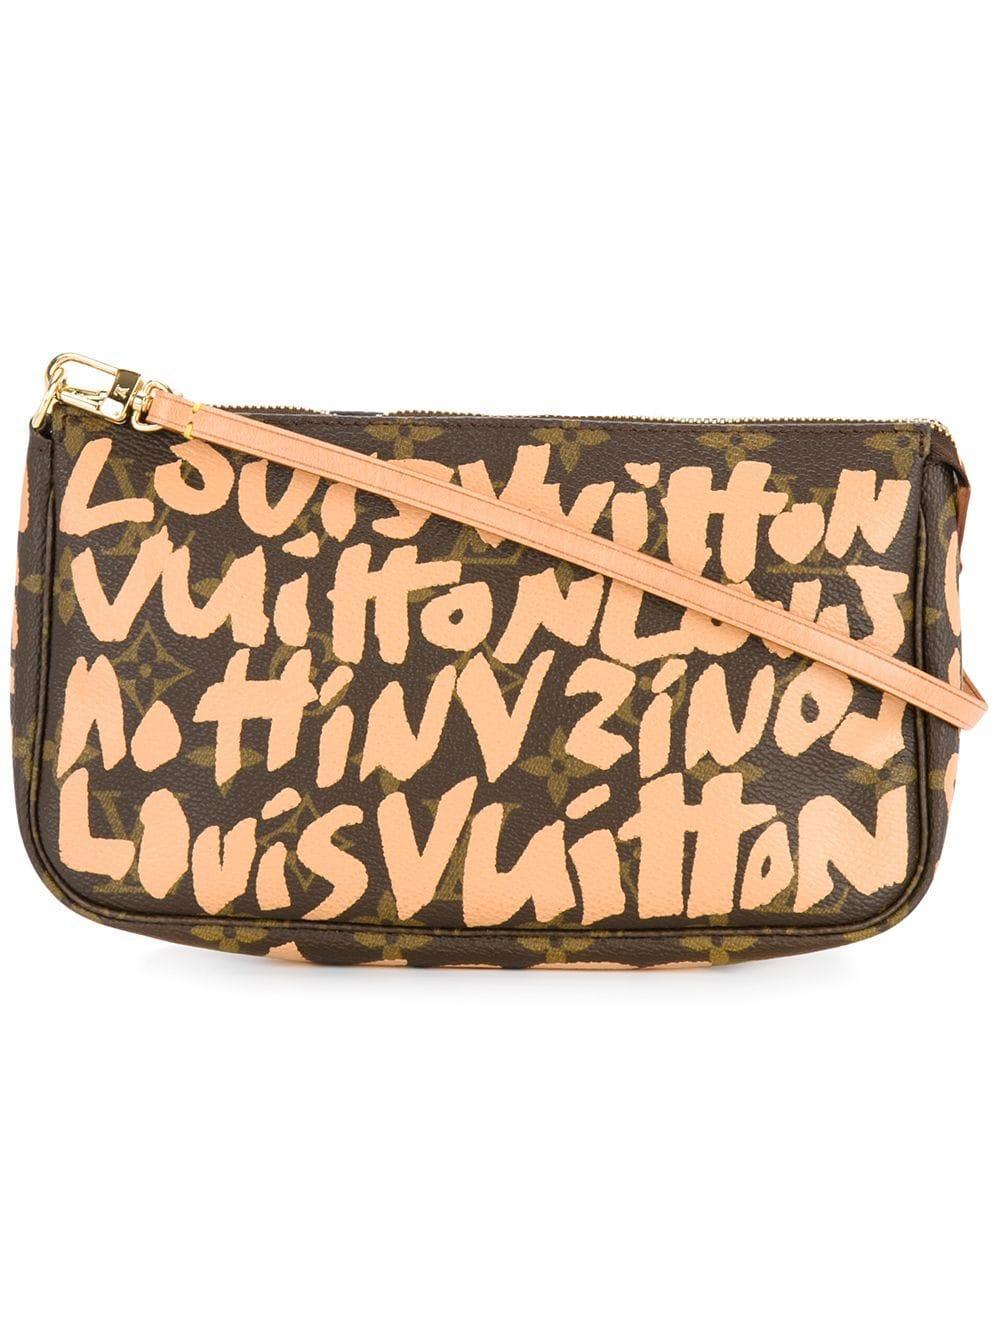 Louis Vuitton Pre-Owned Pochette Accessories Bag - Brown